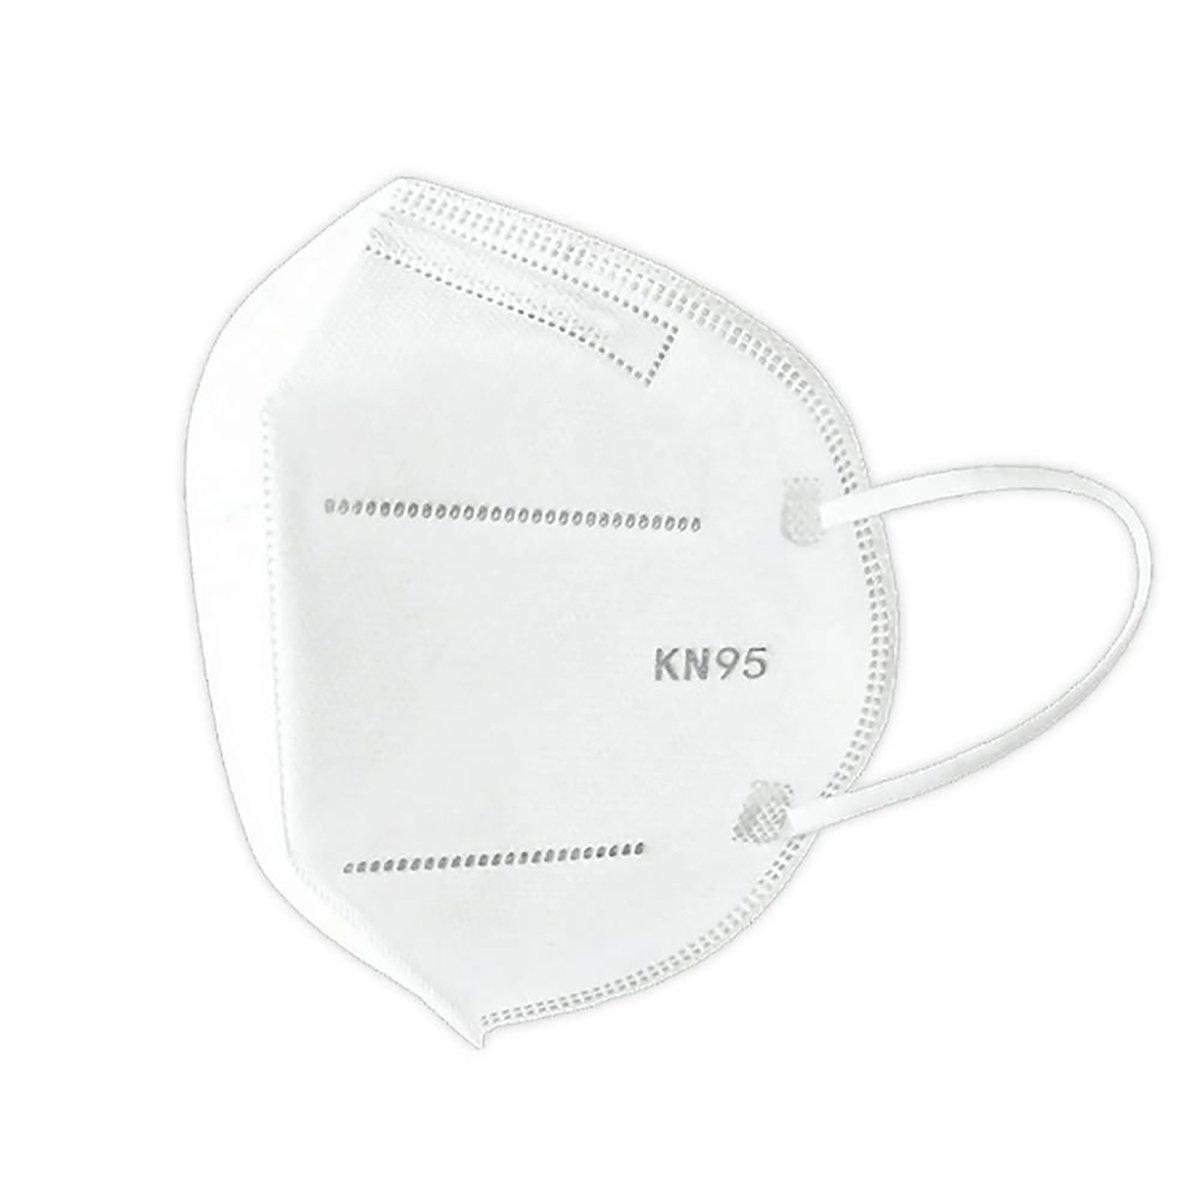 Set 10 bucati, Masca de protectie Envirobest, KN95, FFP2 imagine